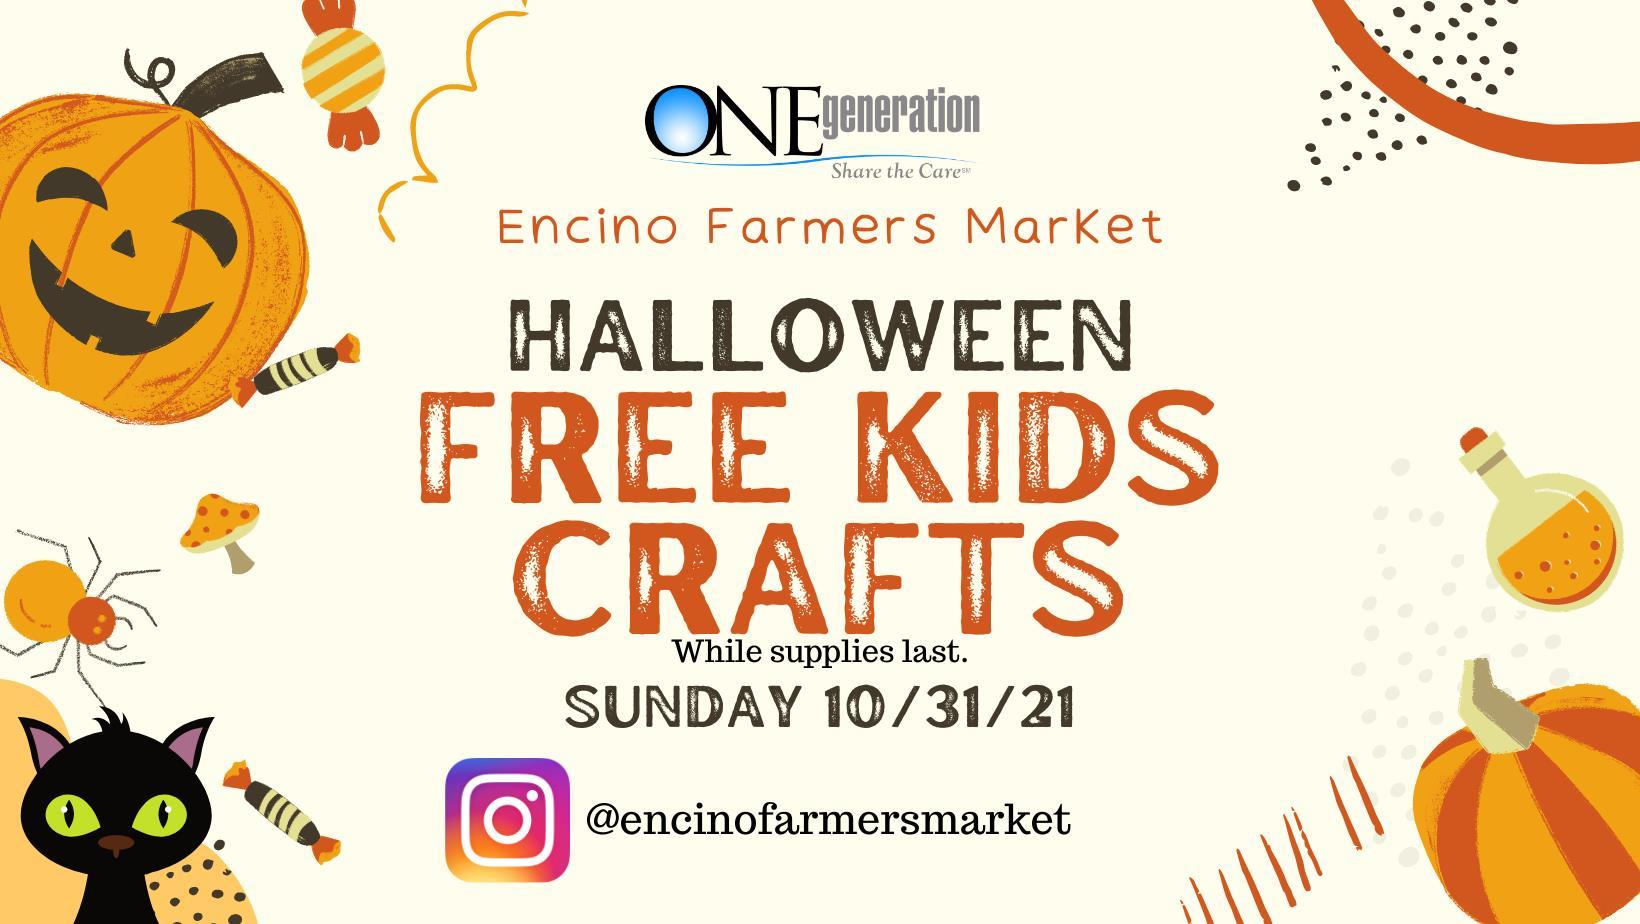 Halloween free kids crafts